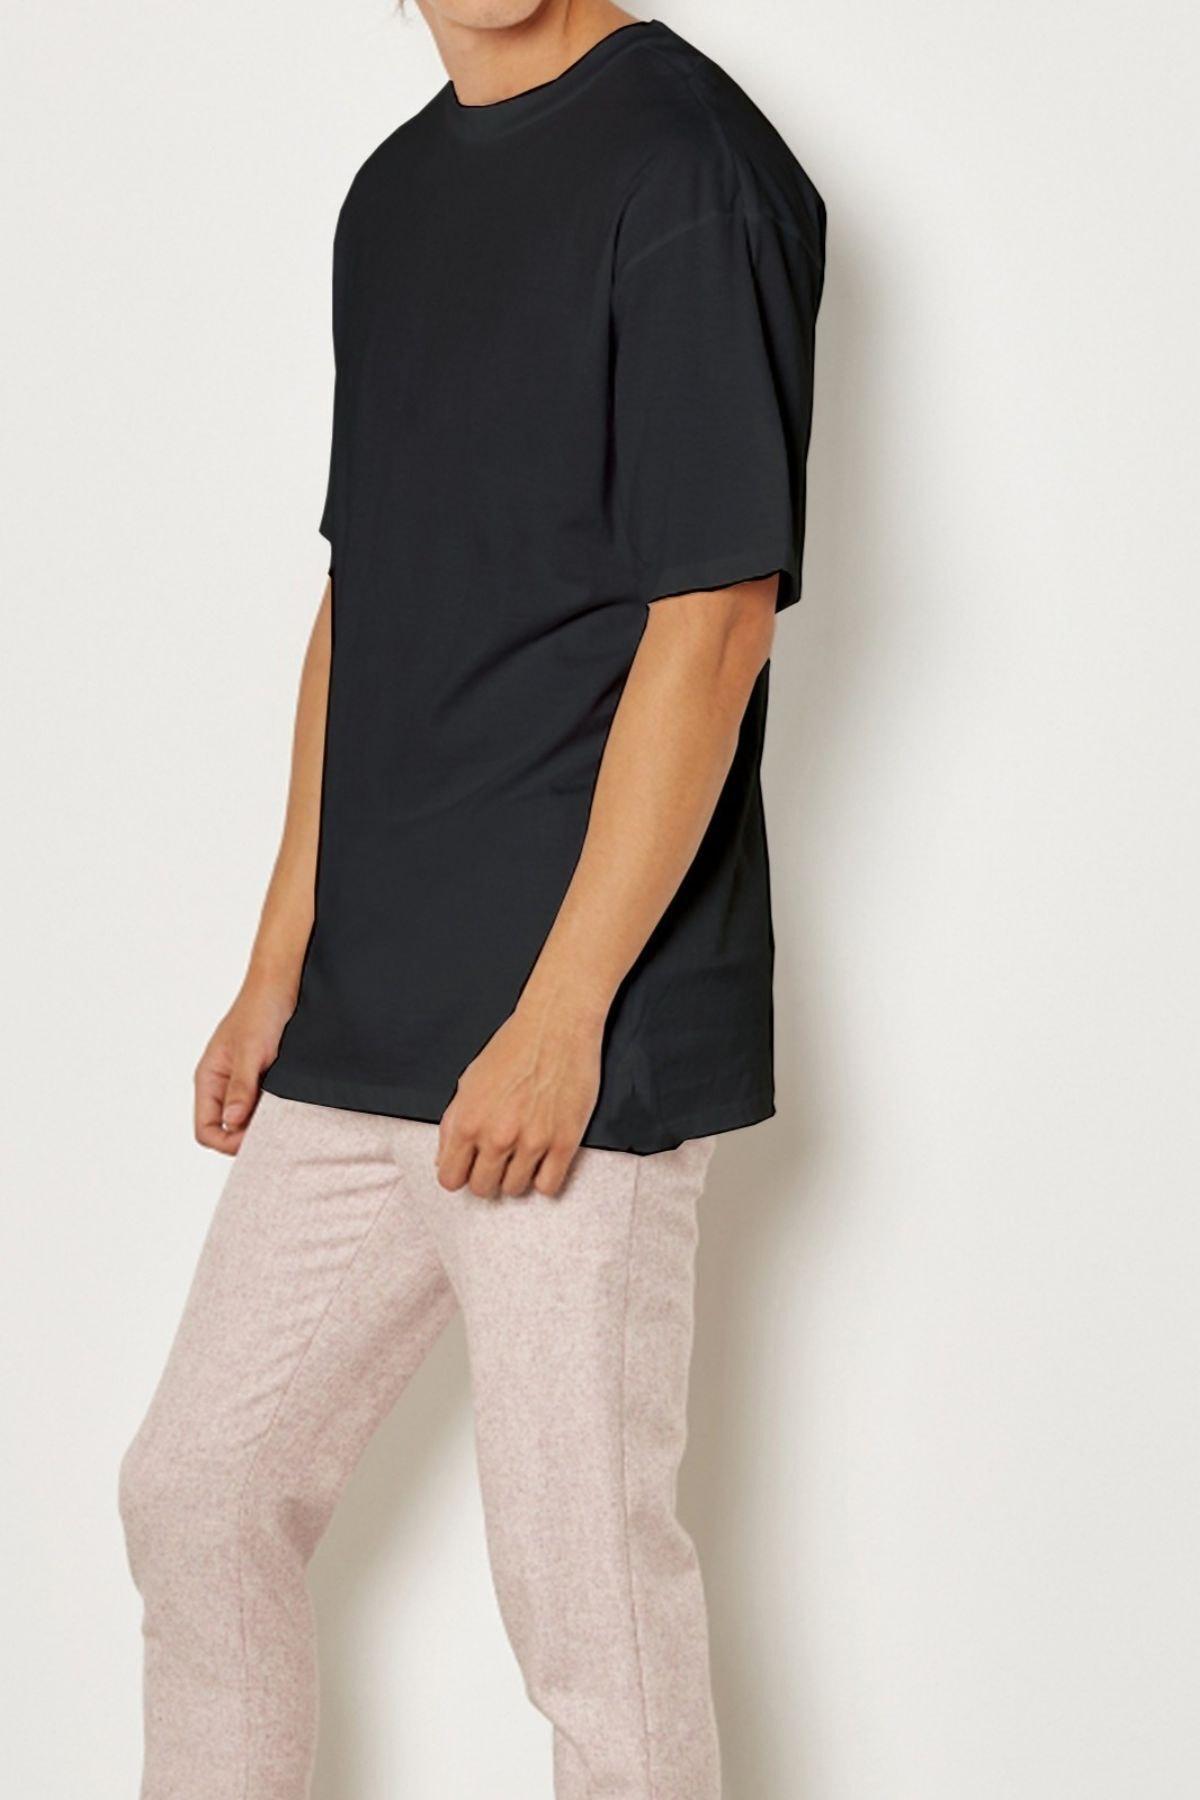 Relax&Basic Erkek Siyah Pamuklu Kısa Kollu Tişört 2